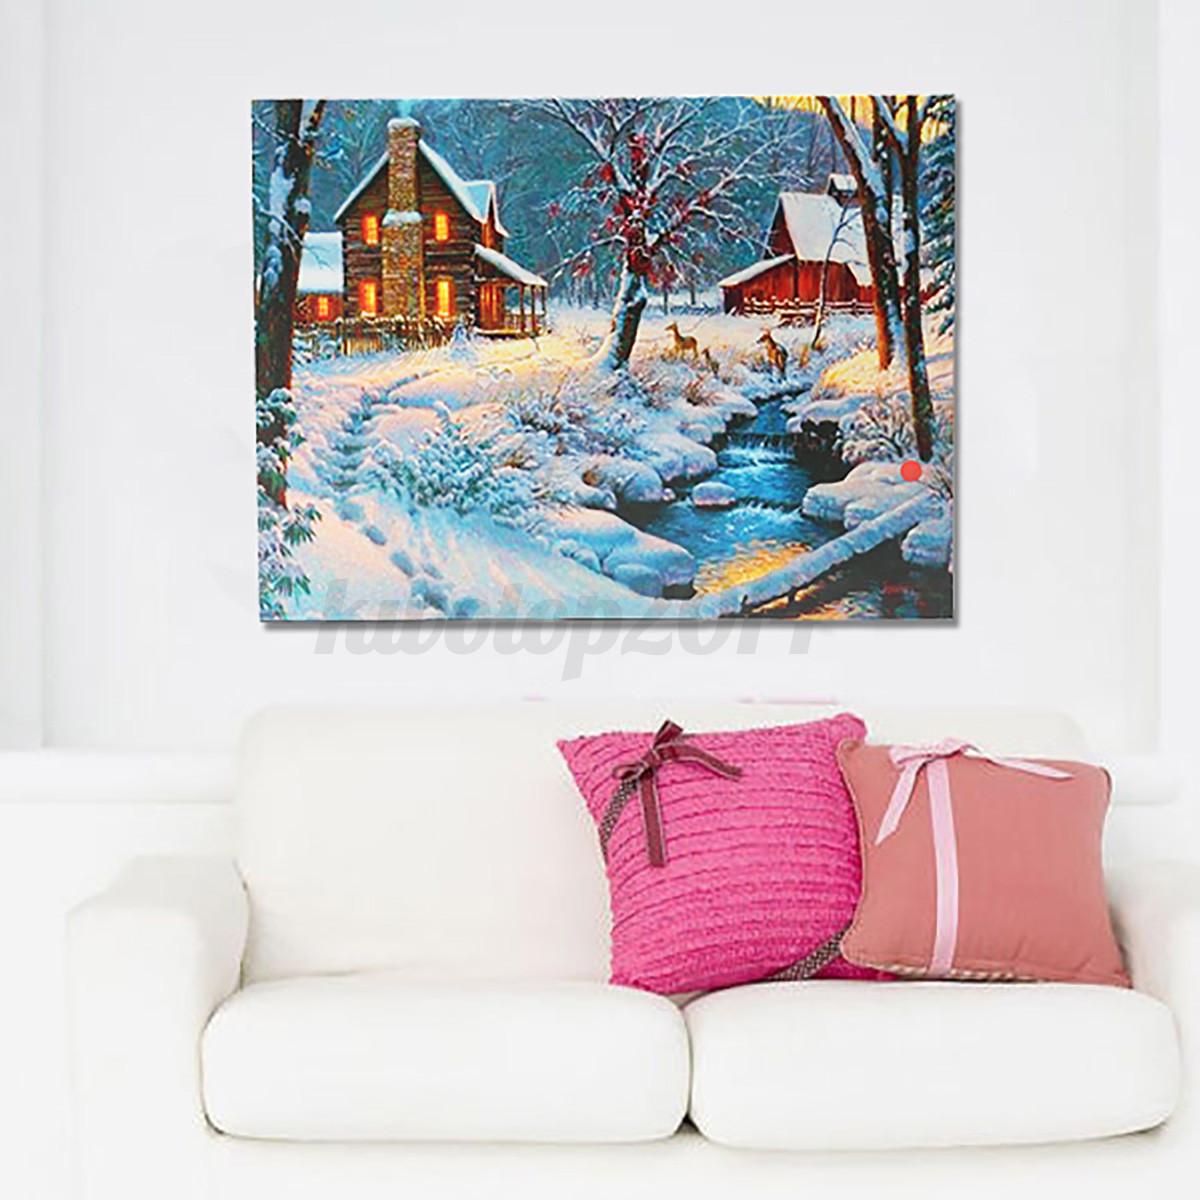 led lighted light up 20 39 39 snow cabin canvas art picture. Black Bedroom Furniture Sets. Home Design Ideas